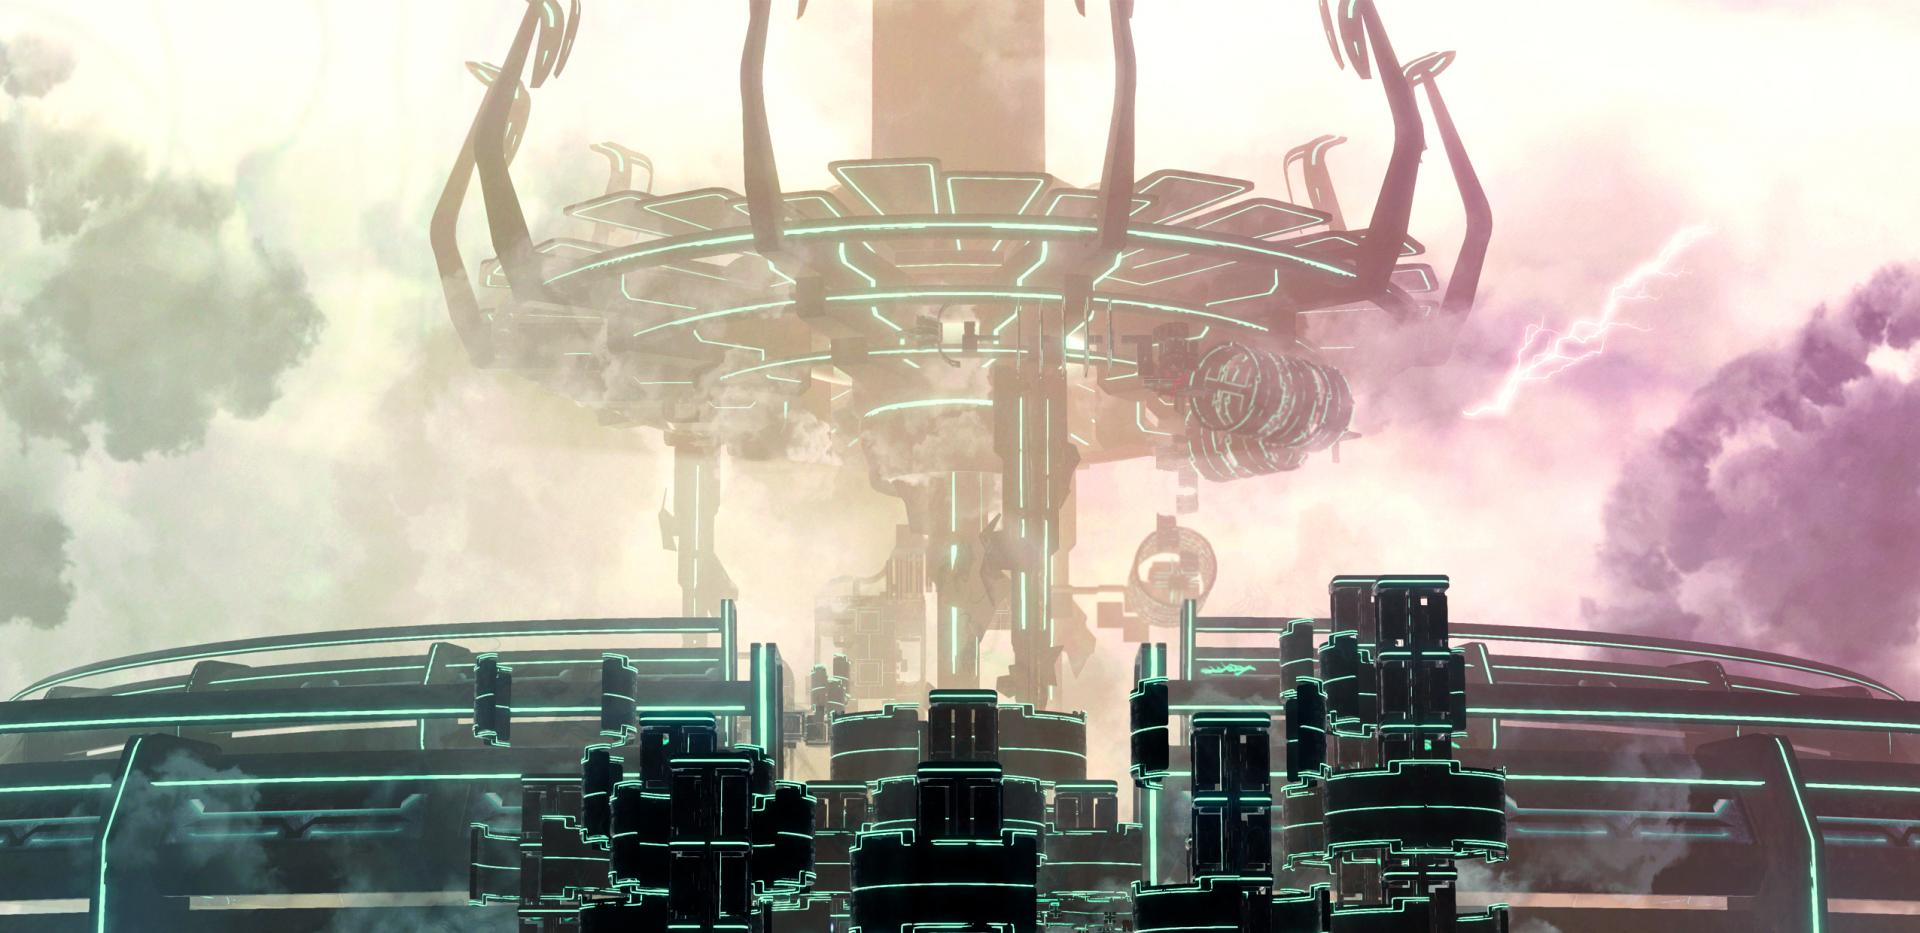 Deadcore storm Gameplay 3